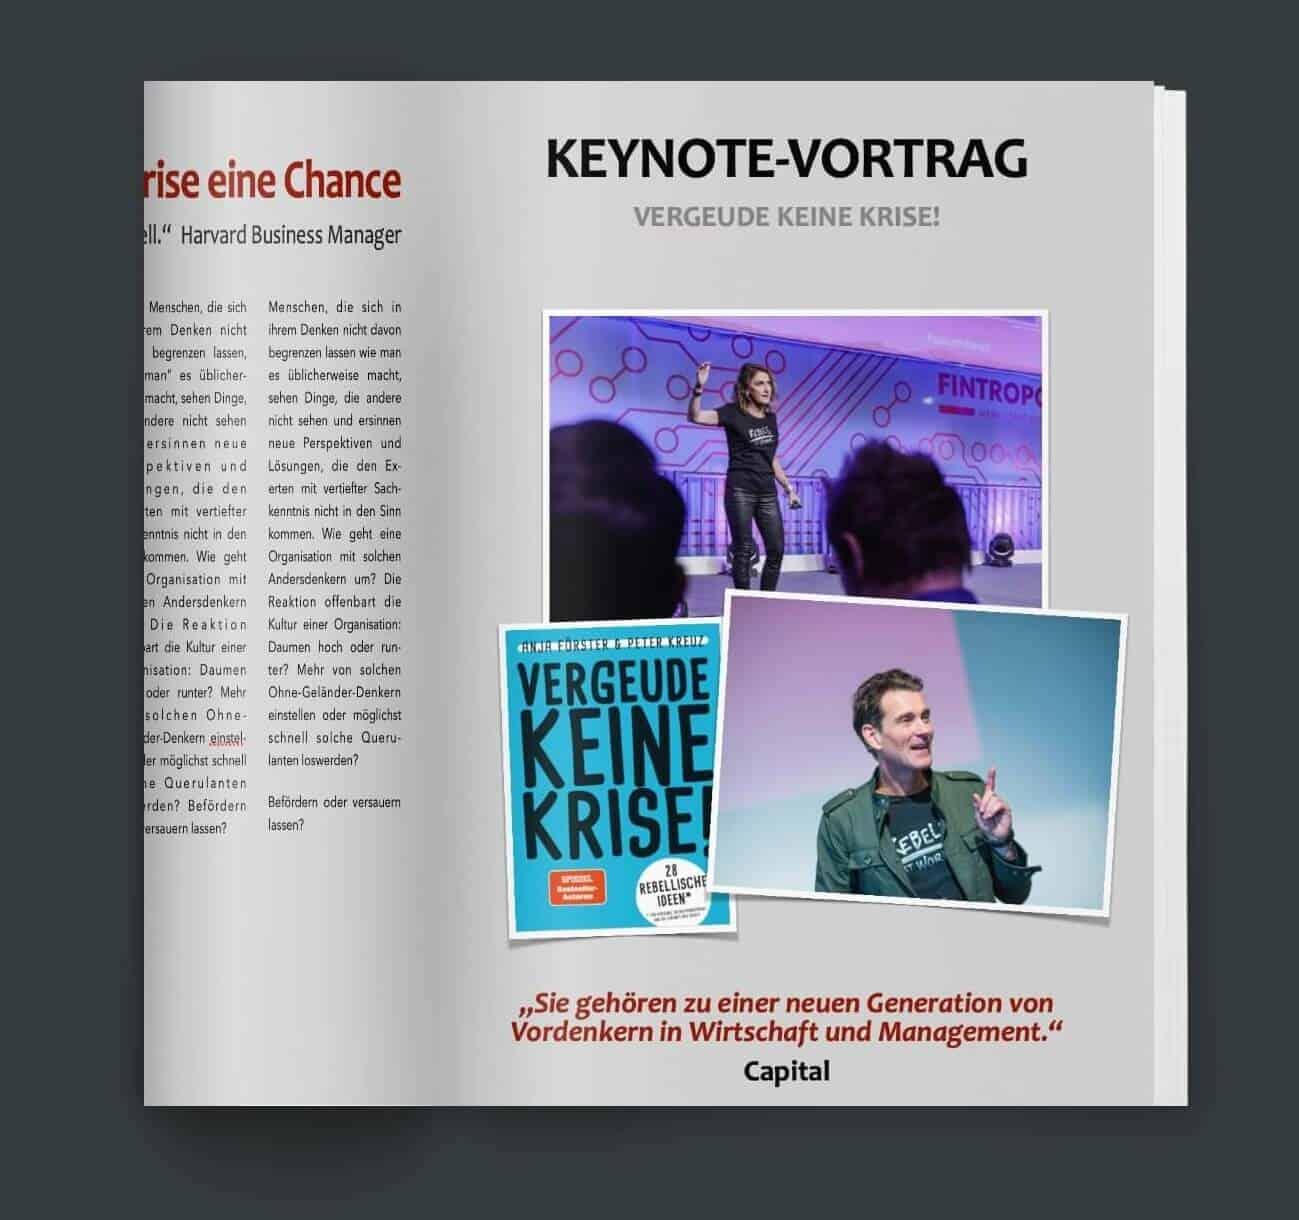 Keynote vortrag